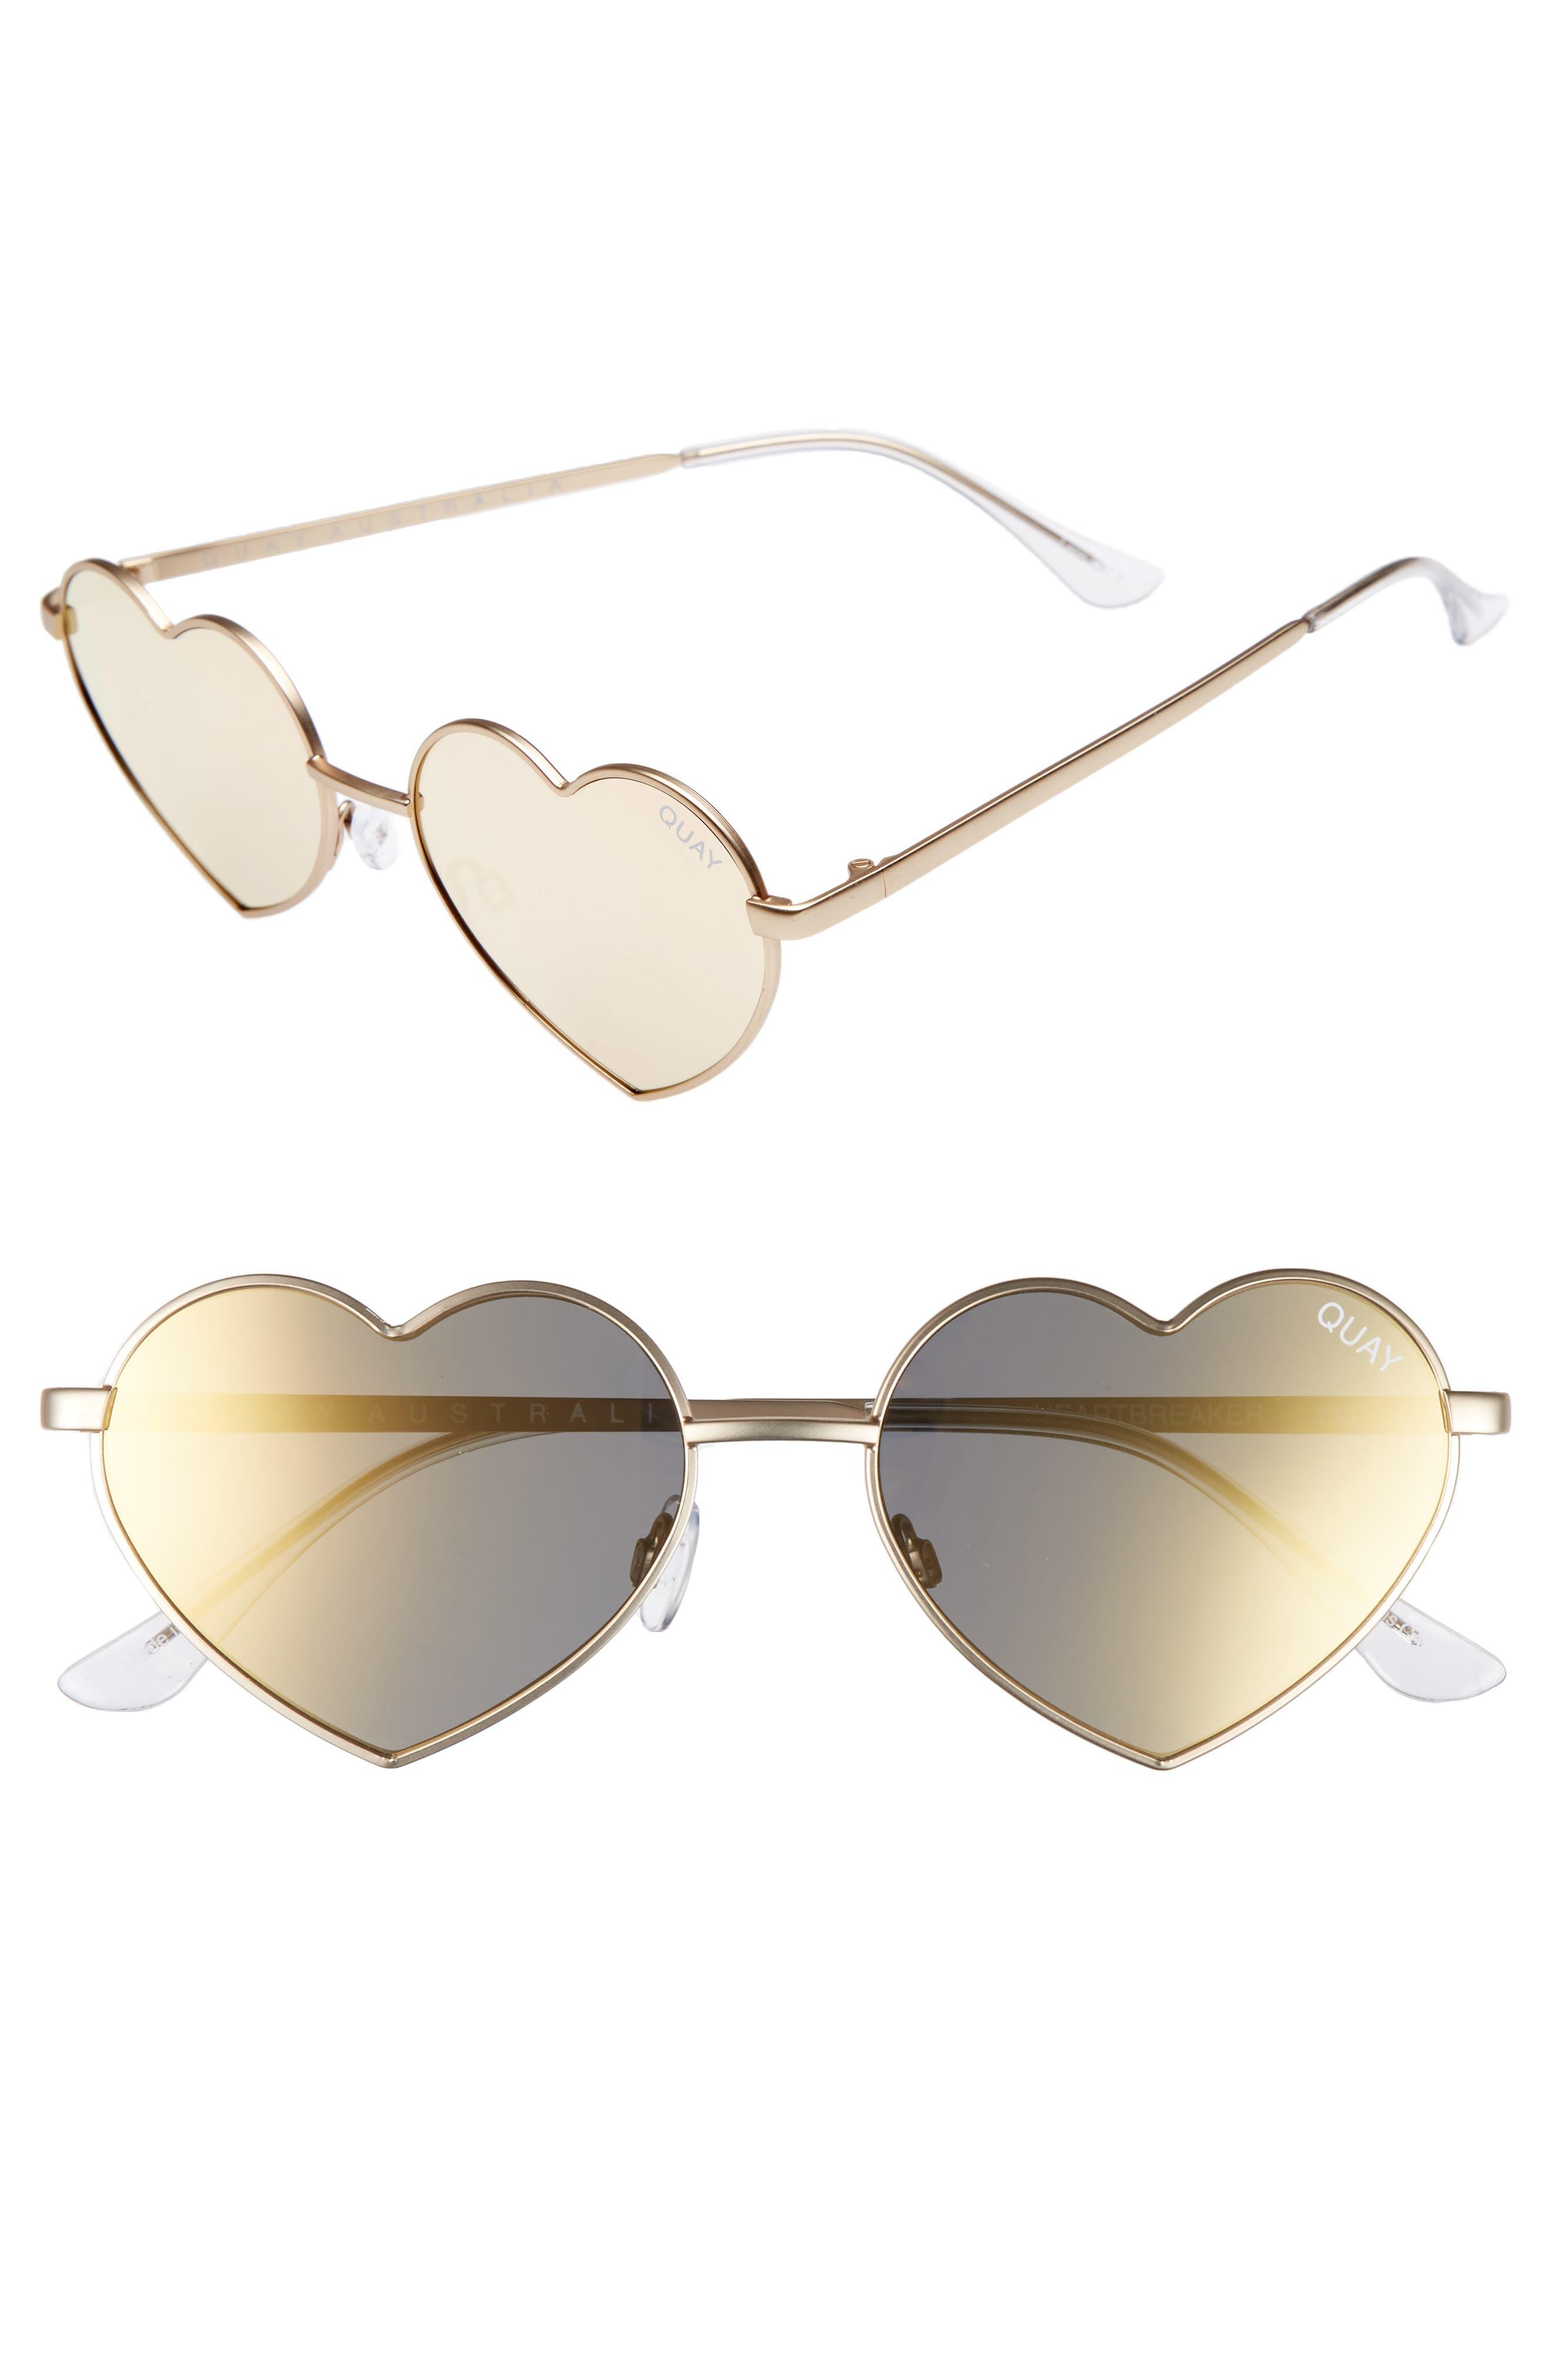 Quay Australia 53mm Heart Breaker Heart-Shaped Sunglasses